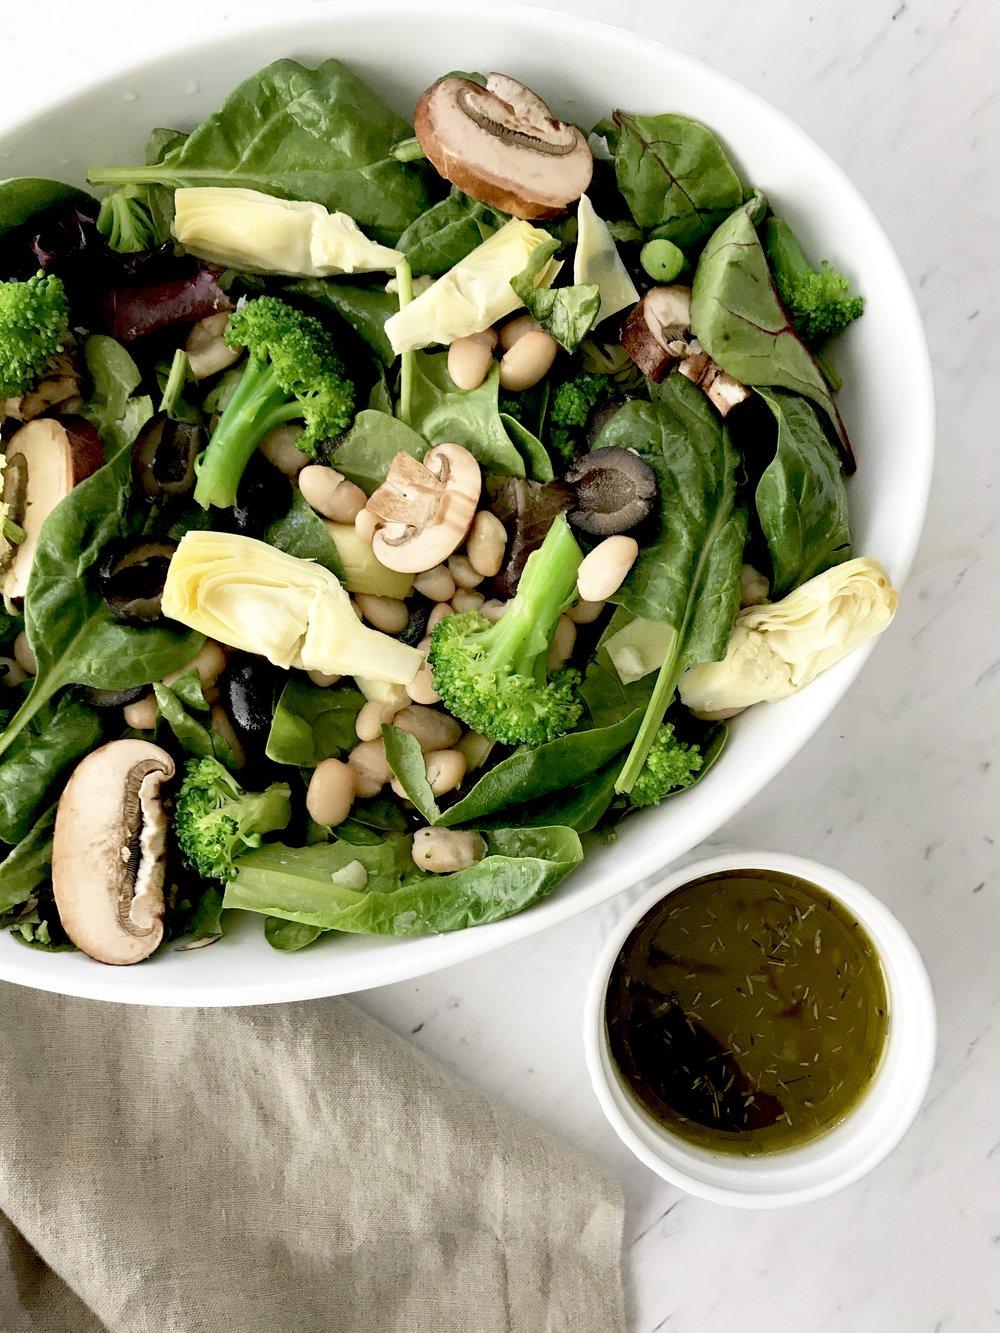 Artichoke Black Olive Salad with Herb Vinaigrette